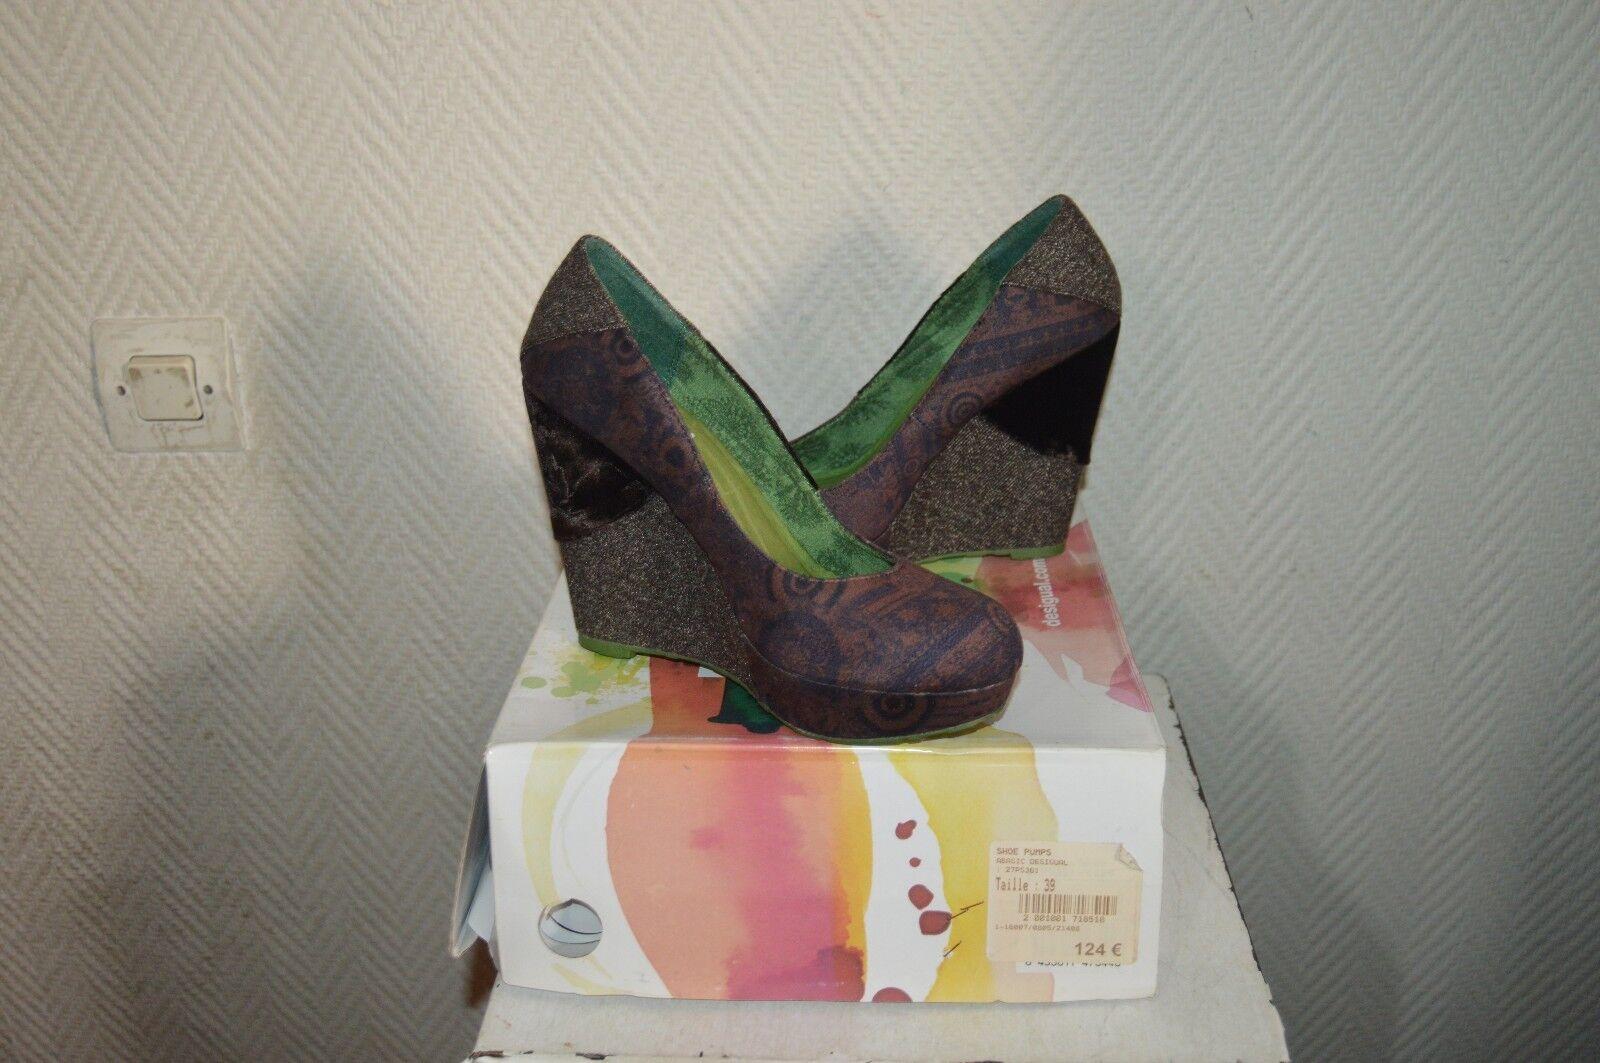 CHAUSSURE ESCARPIN COMPENSE DESIGUÄL  39 / UK 6 NEUF CUIR  Schuhe/SCAPA/ZAPATOS